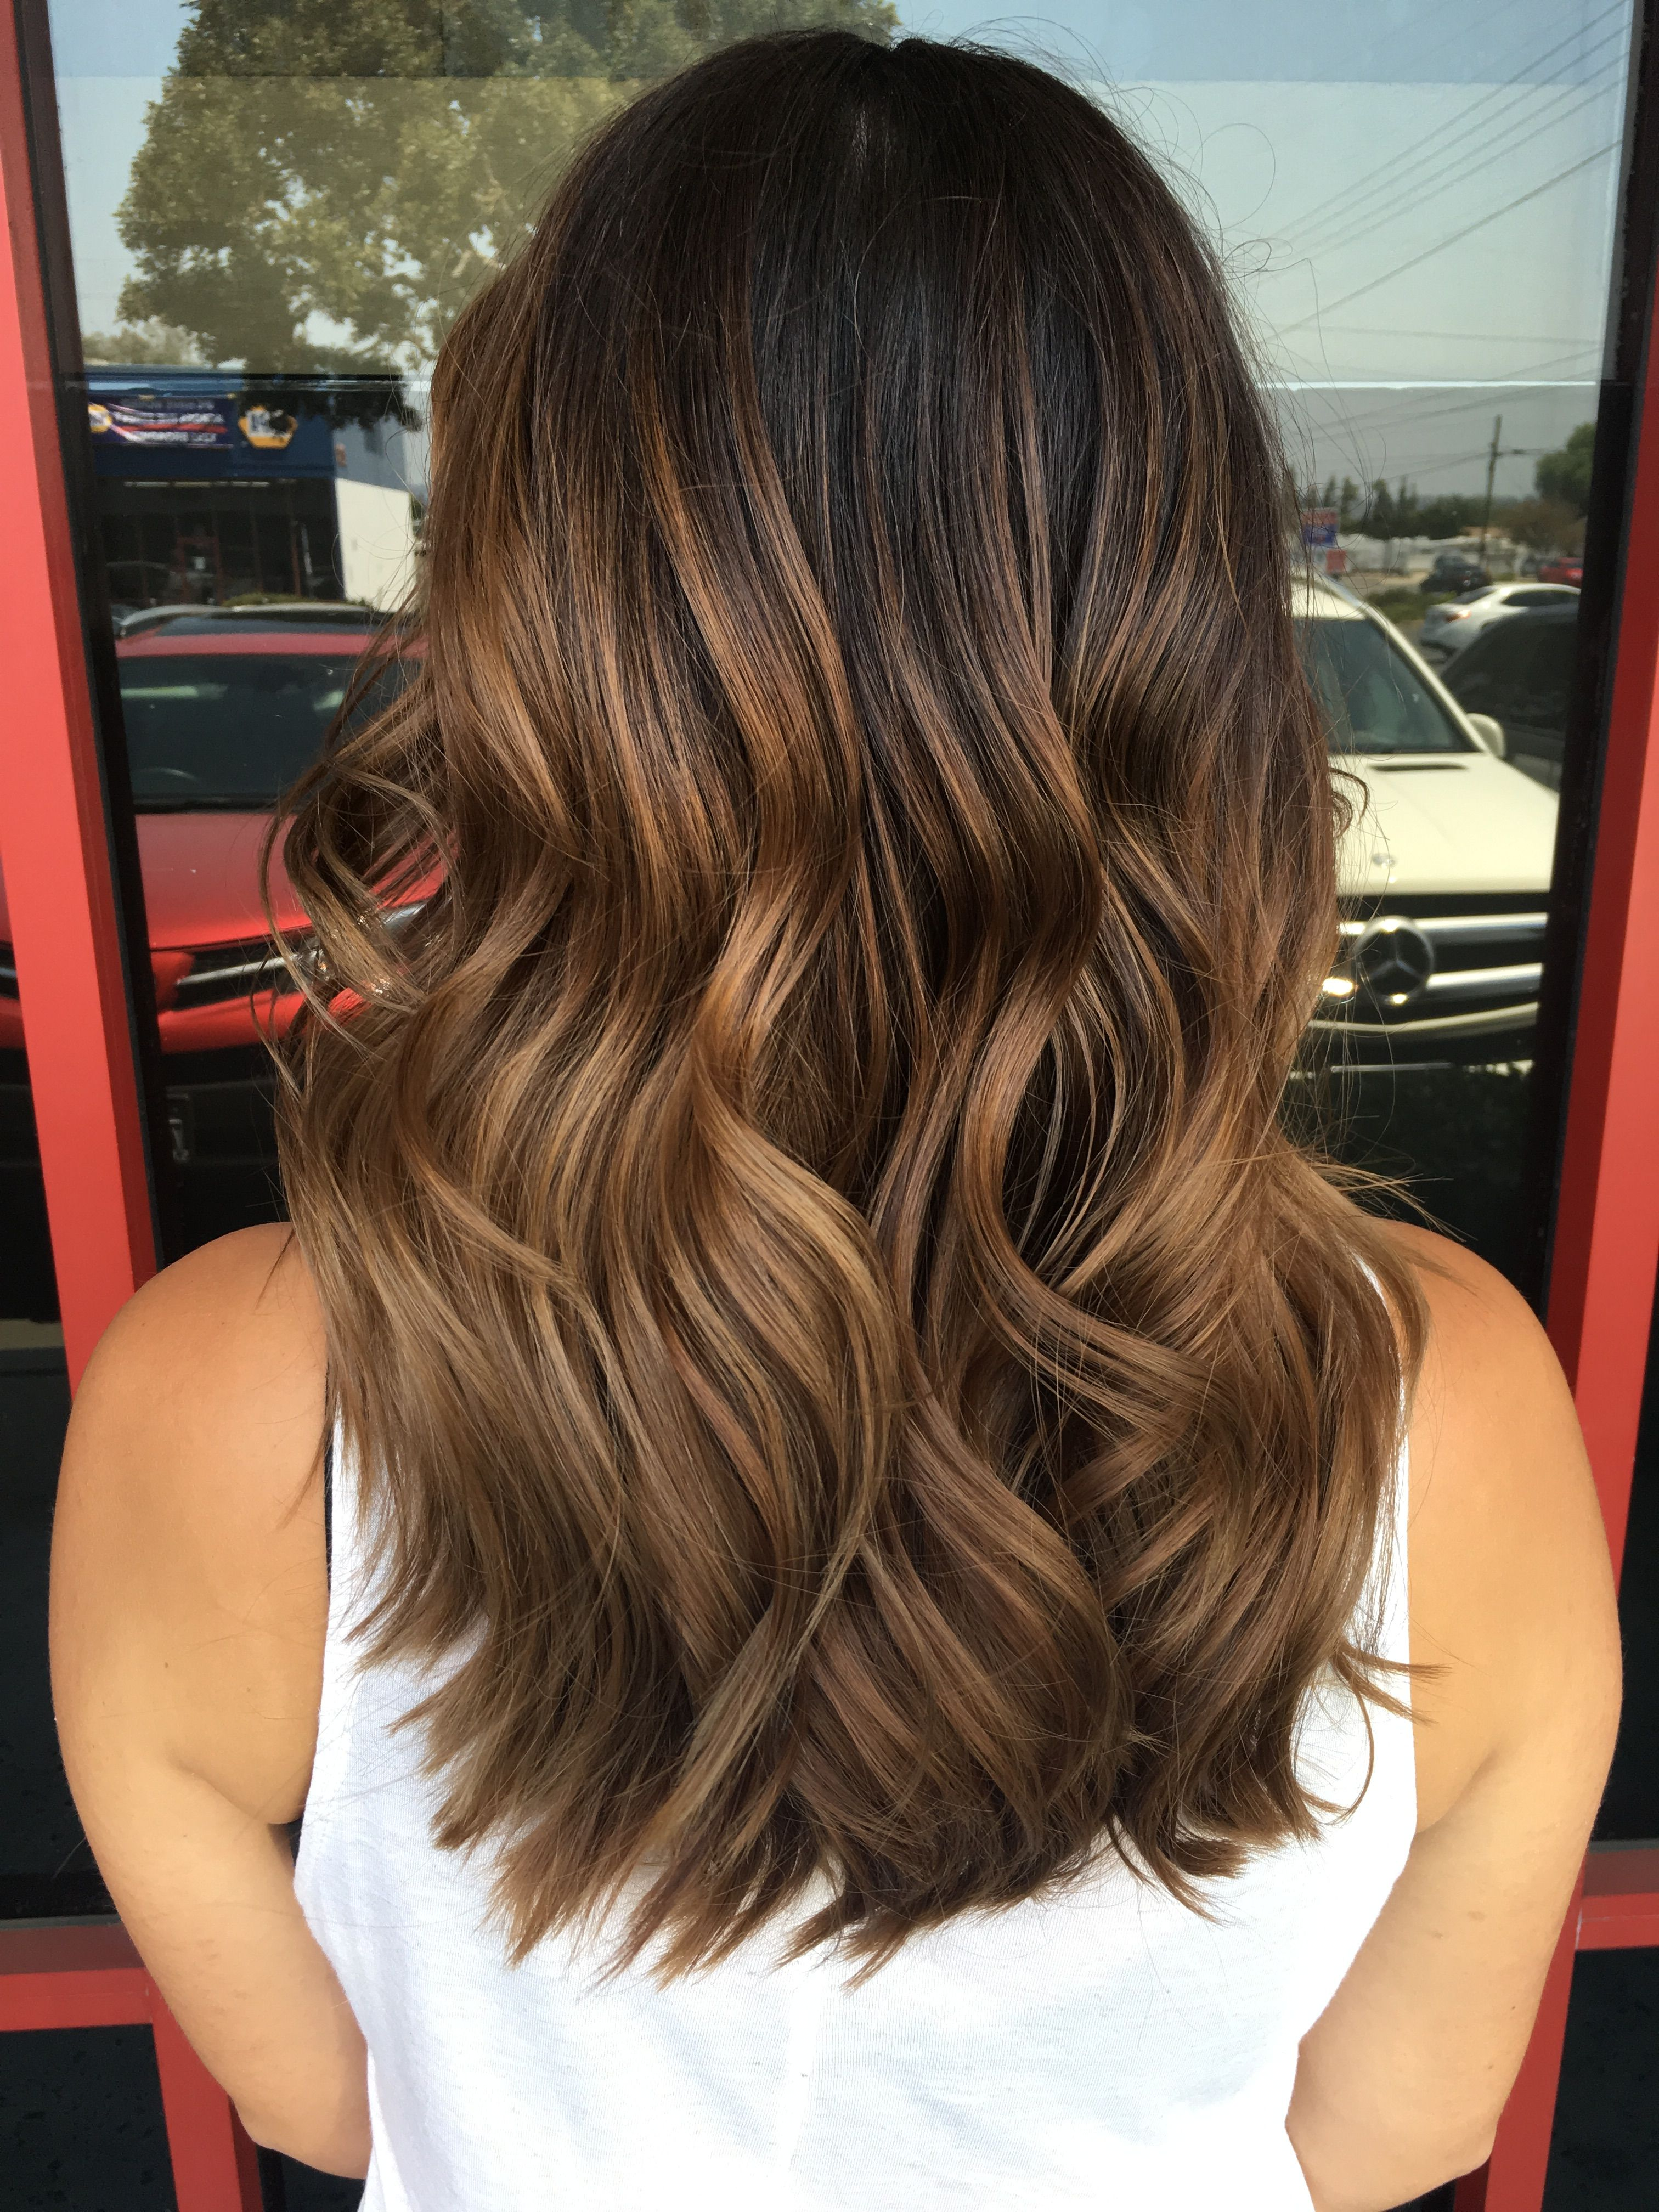 Balayage Hair Balayage Highlights Brown Balayage Hair Highlights Dark Brown Hair Hair Painting Brown Hair Balayage Medium Length Hair Styles Boliage Hair